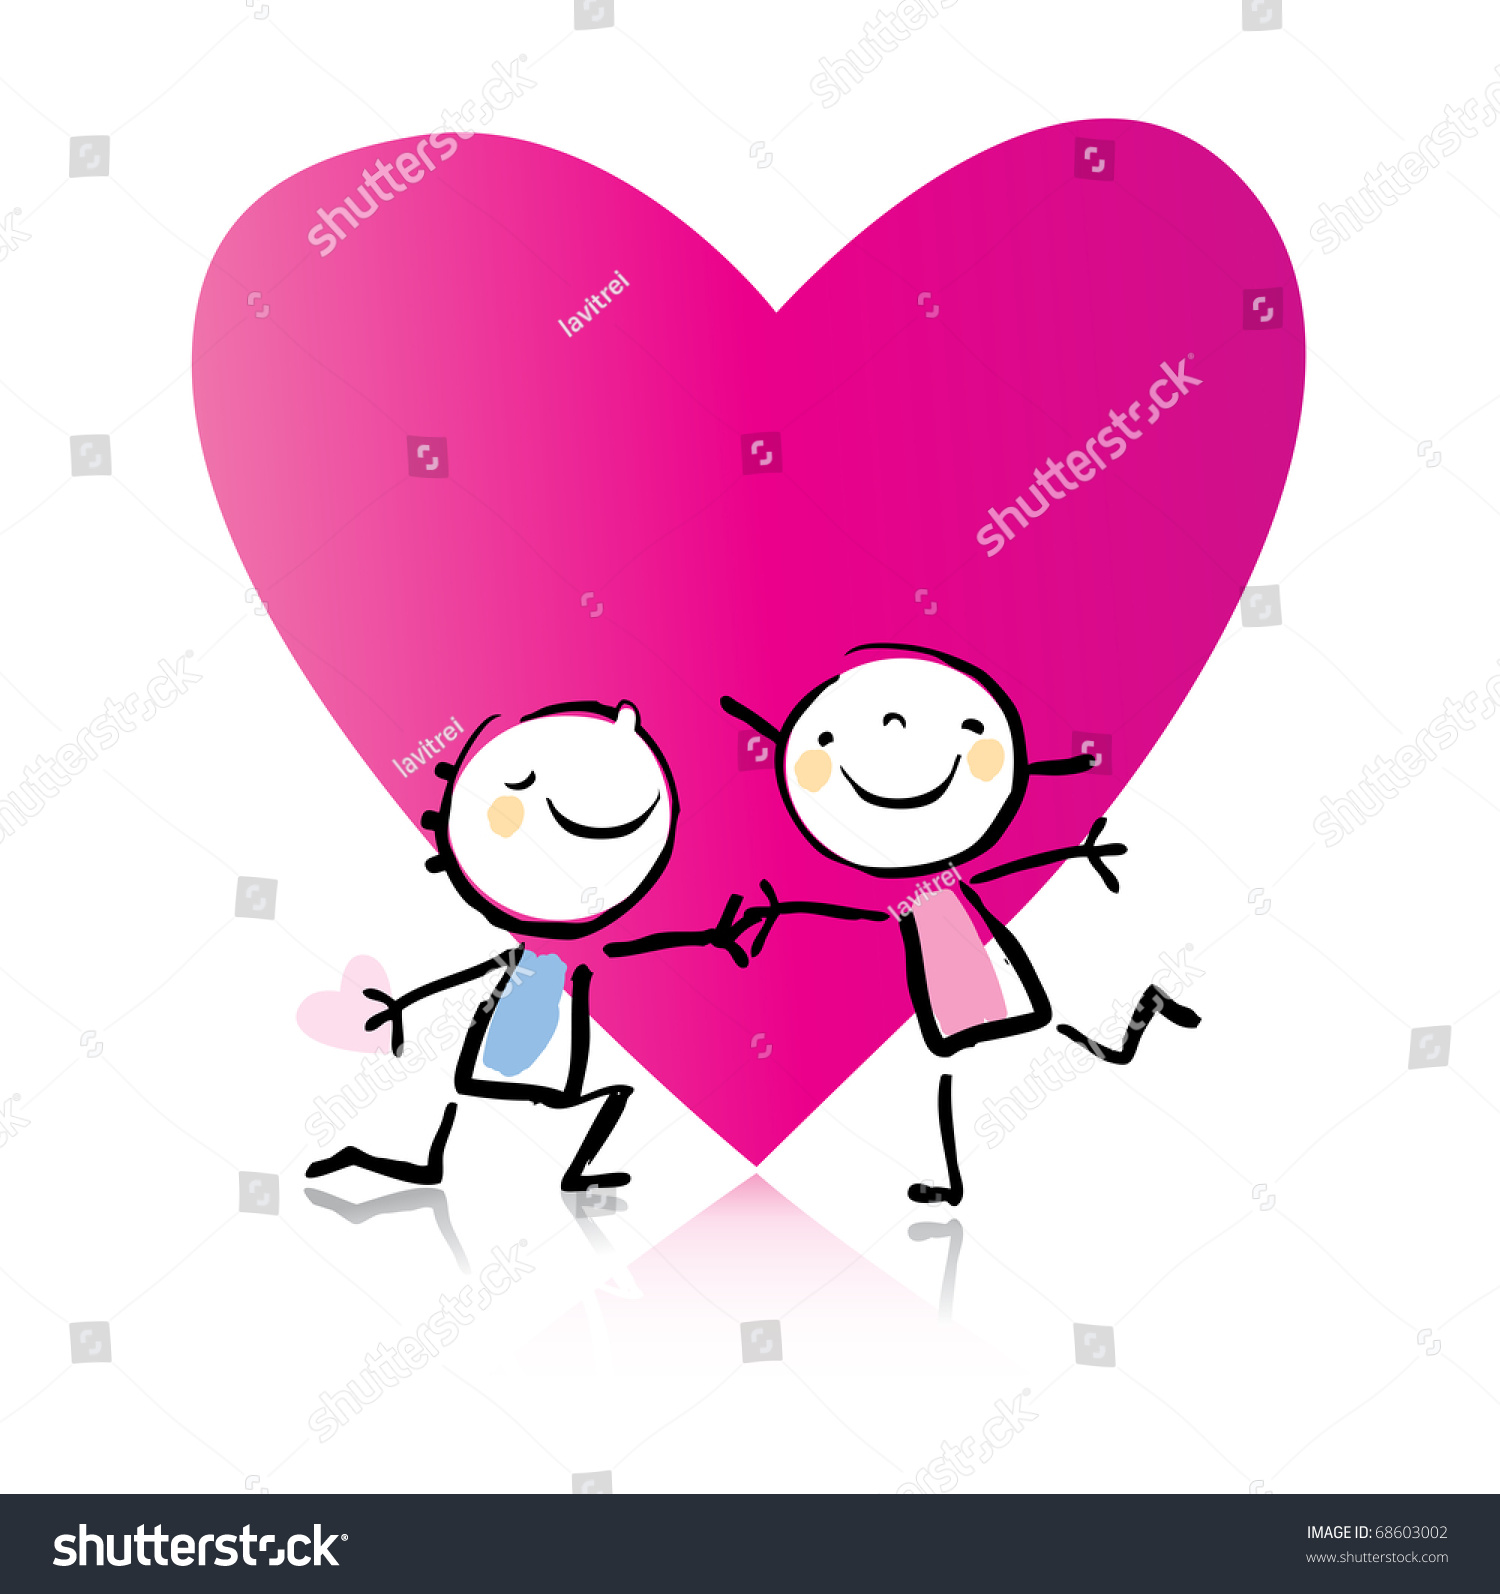 Valentines Day Cartoon Romantic Couple Love Stock Vector Royalty Free 68603002